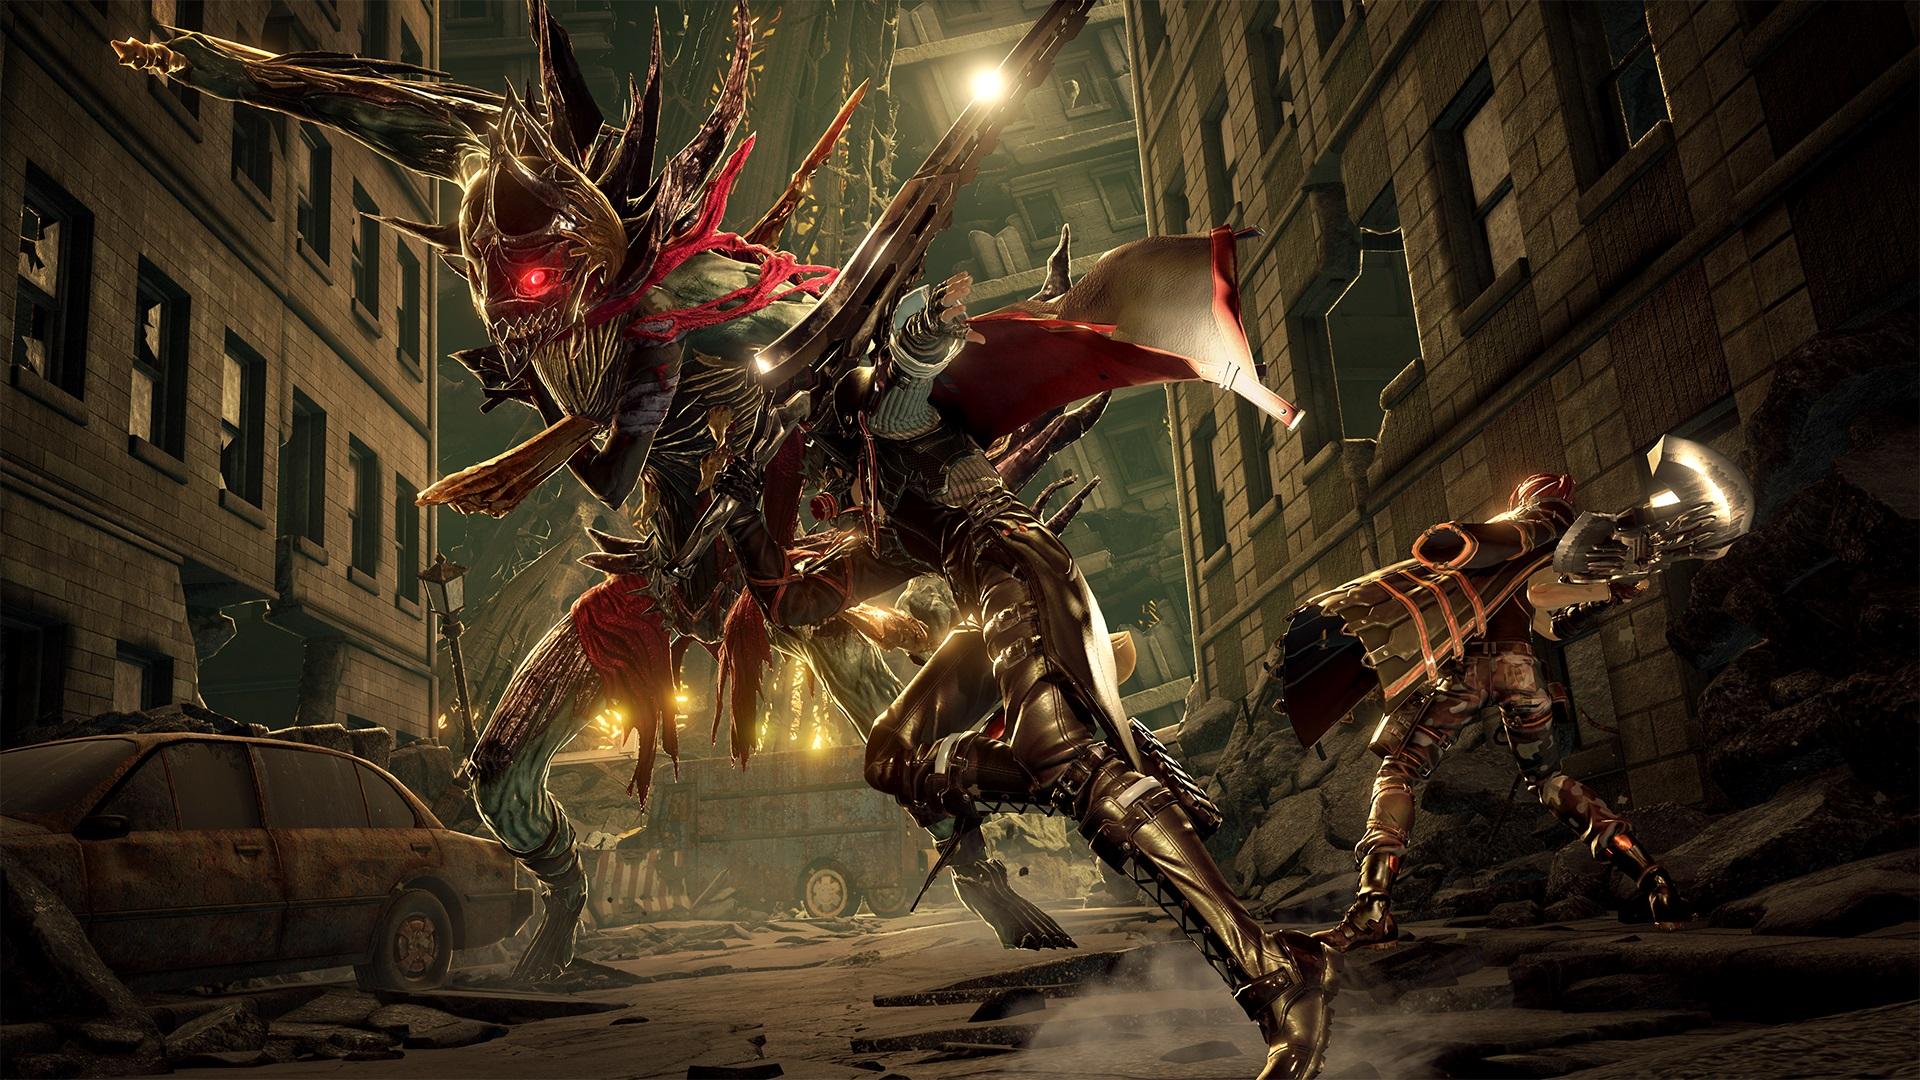 Bandai Namco Announces A New JRPG Called 'Code Vein'